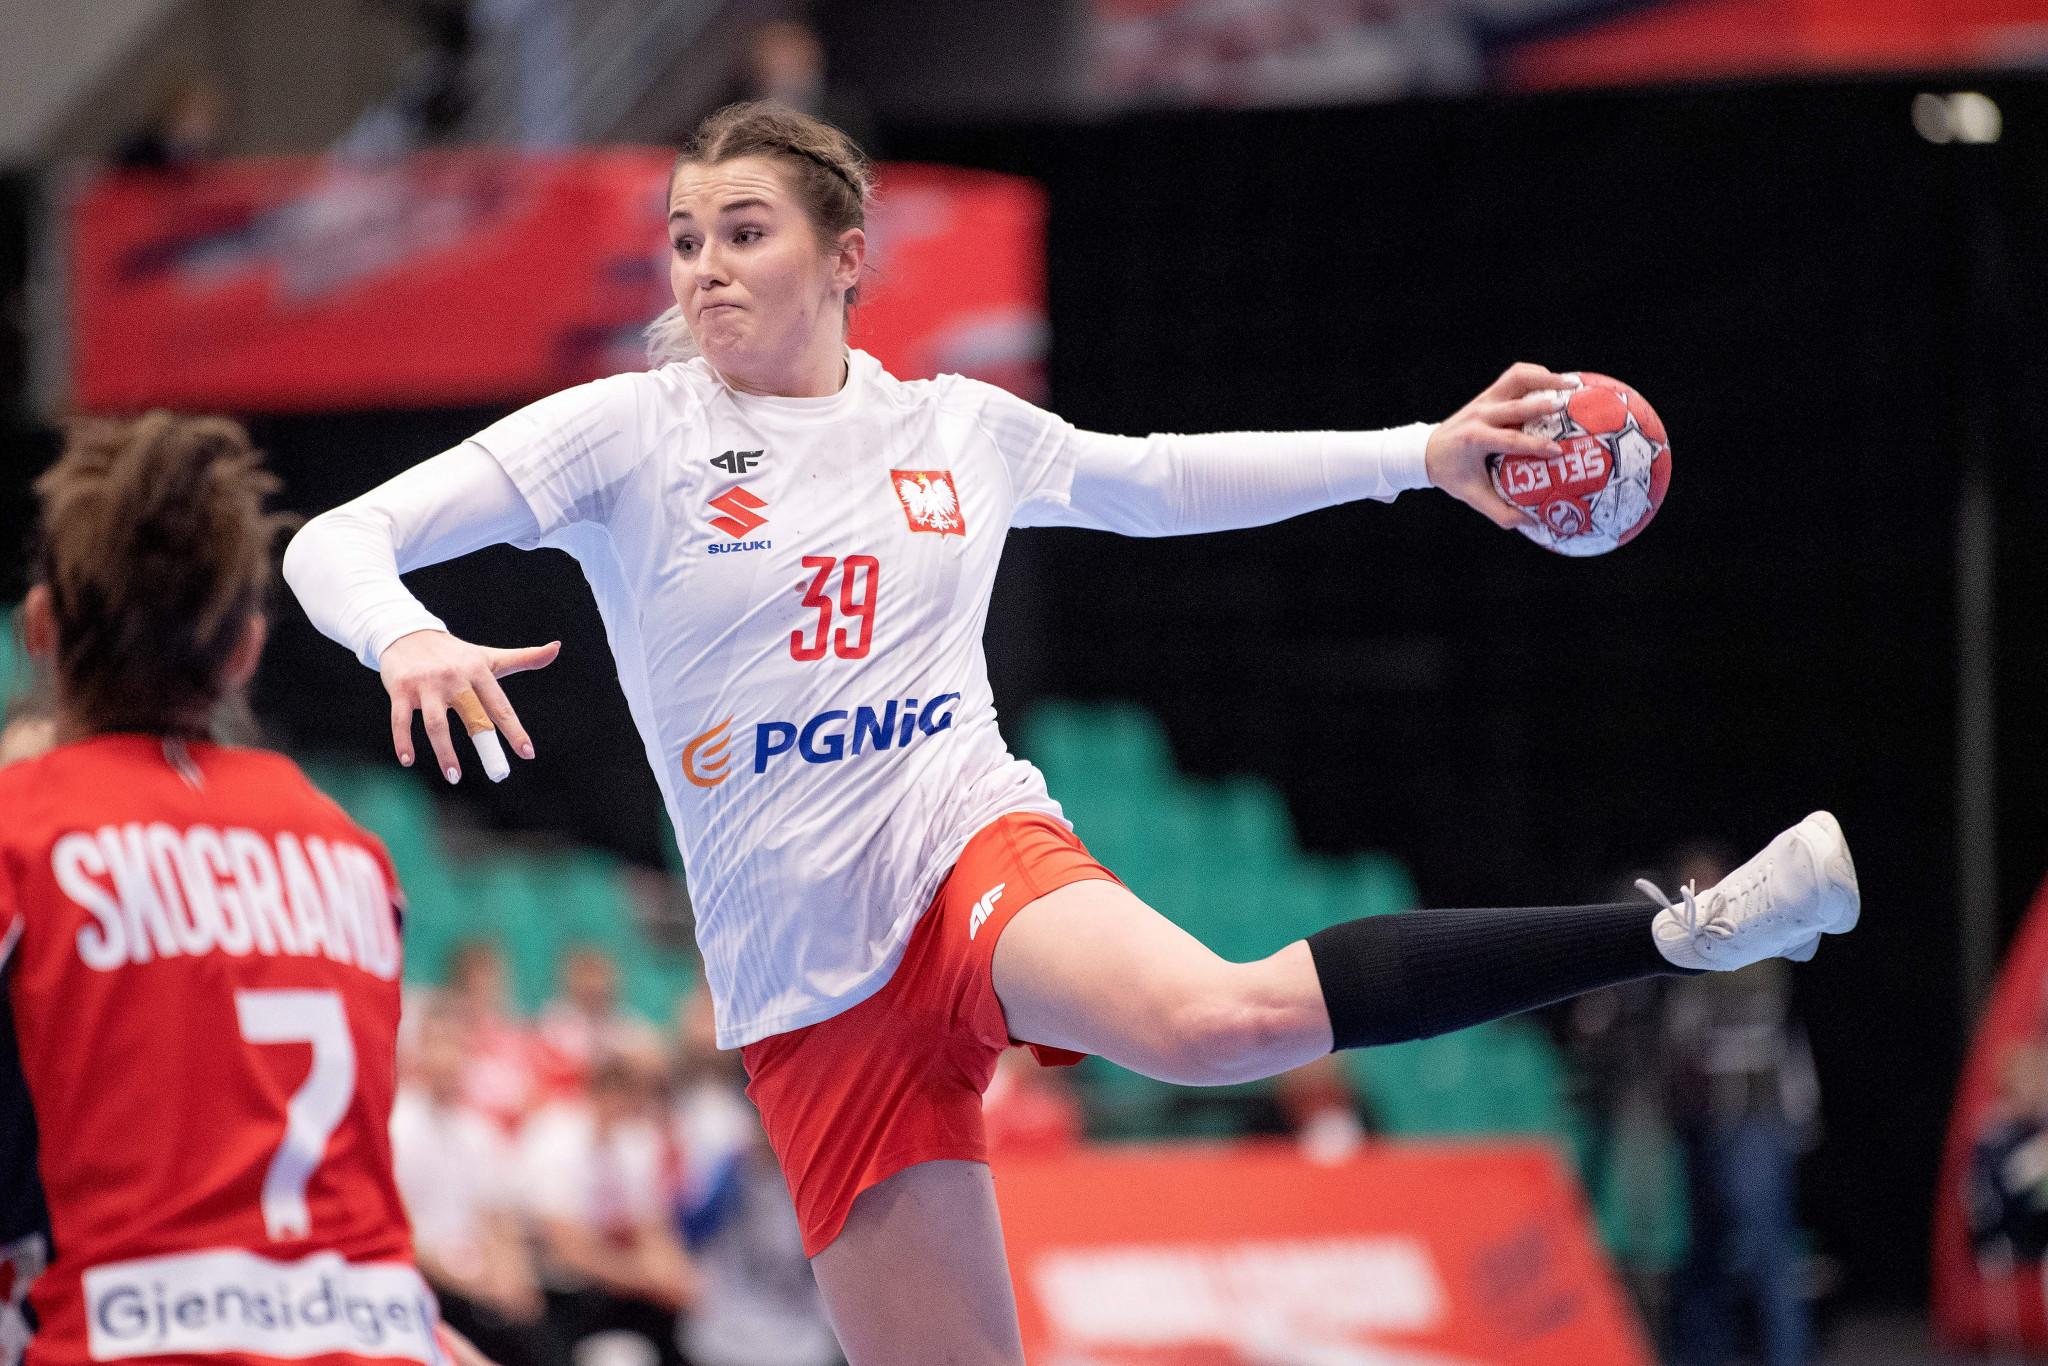 Poland and Slovakia awarded wildcards for 2021 Women's World Handball Championship